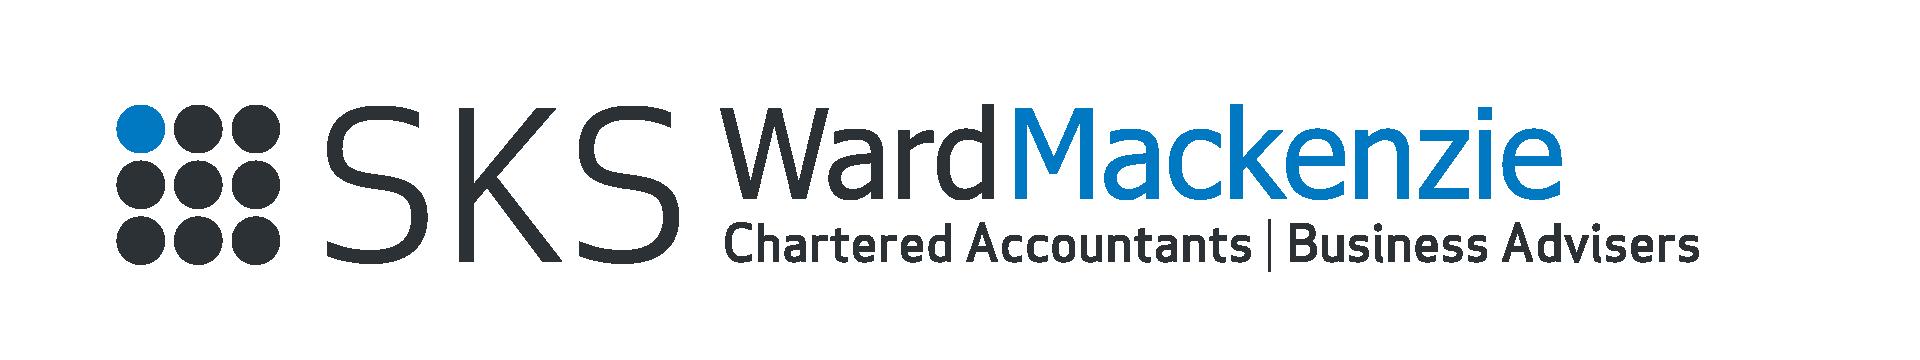 SKS_Brands_v9_SKS_WardMackenzie